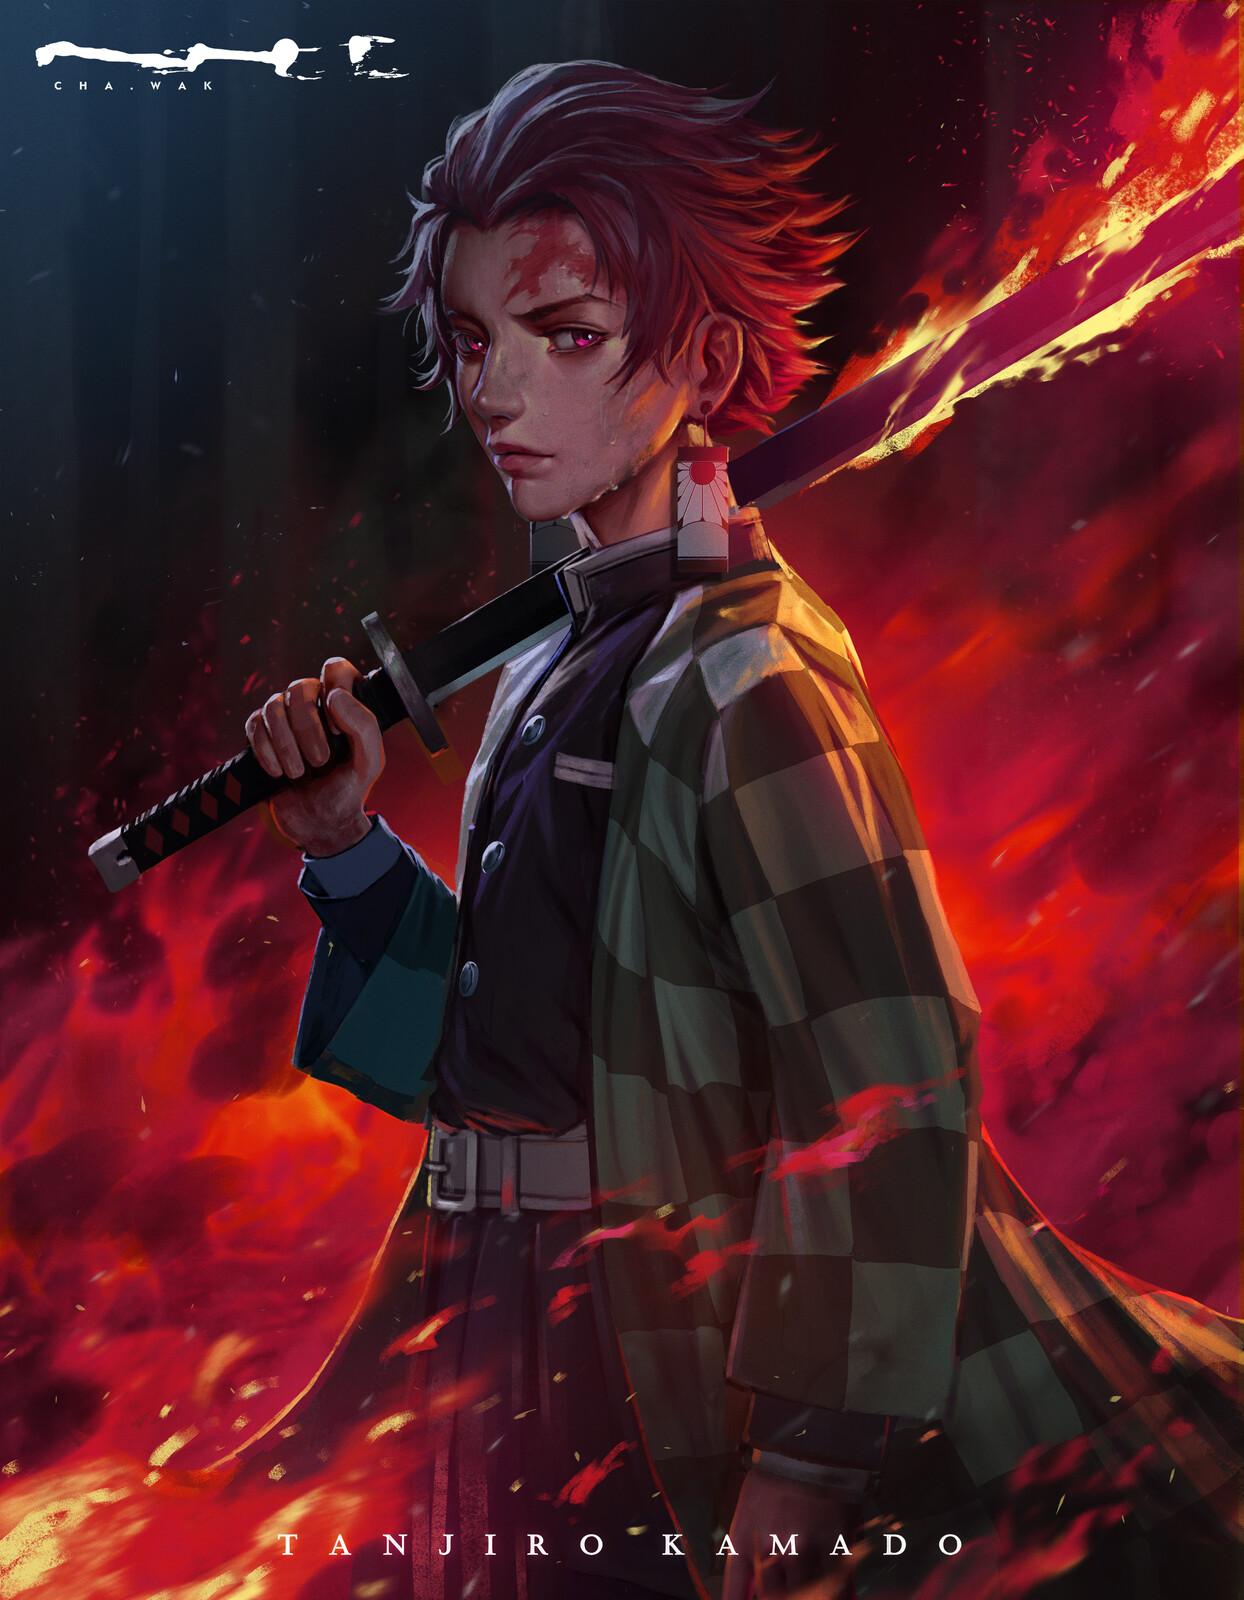 Demon Slayer - Tanjiro Kamado - Fanart